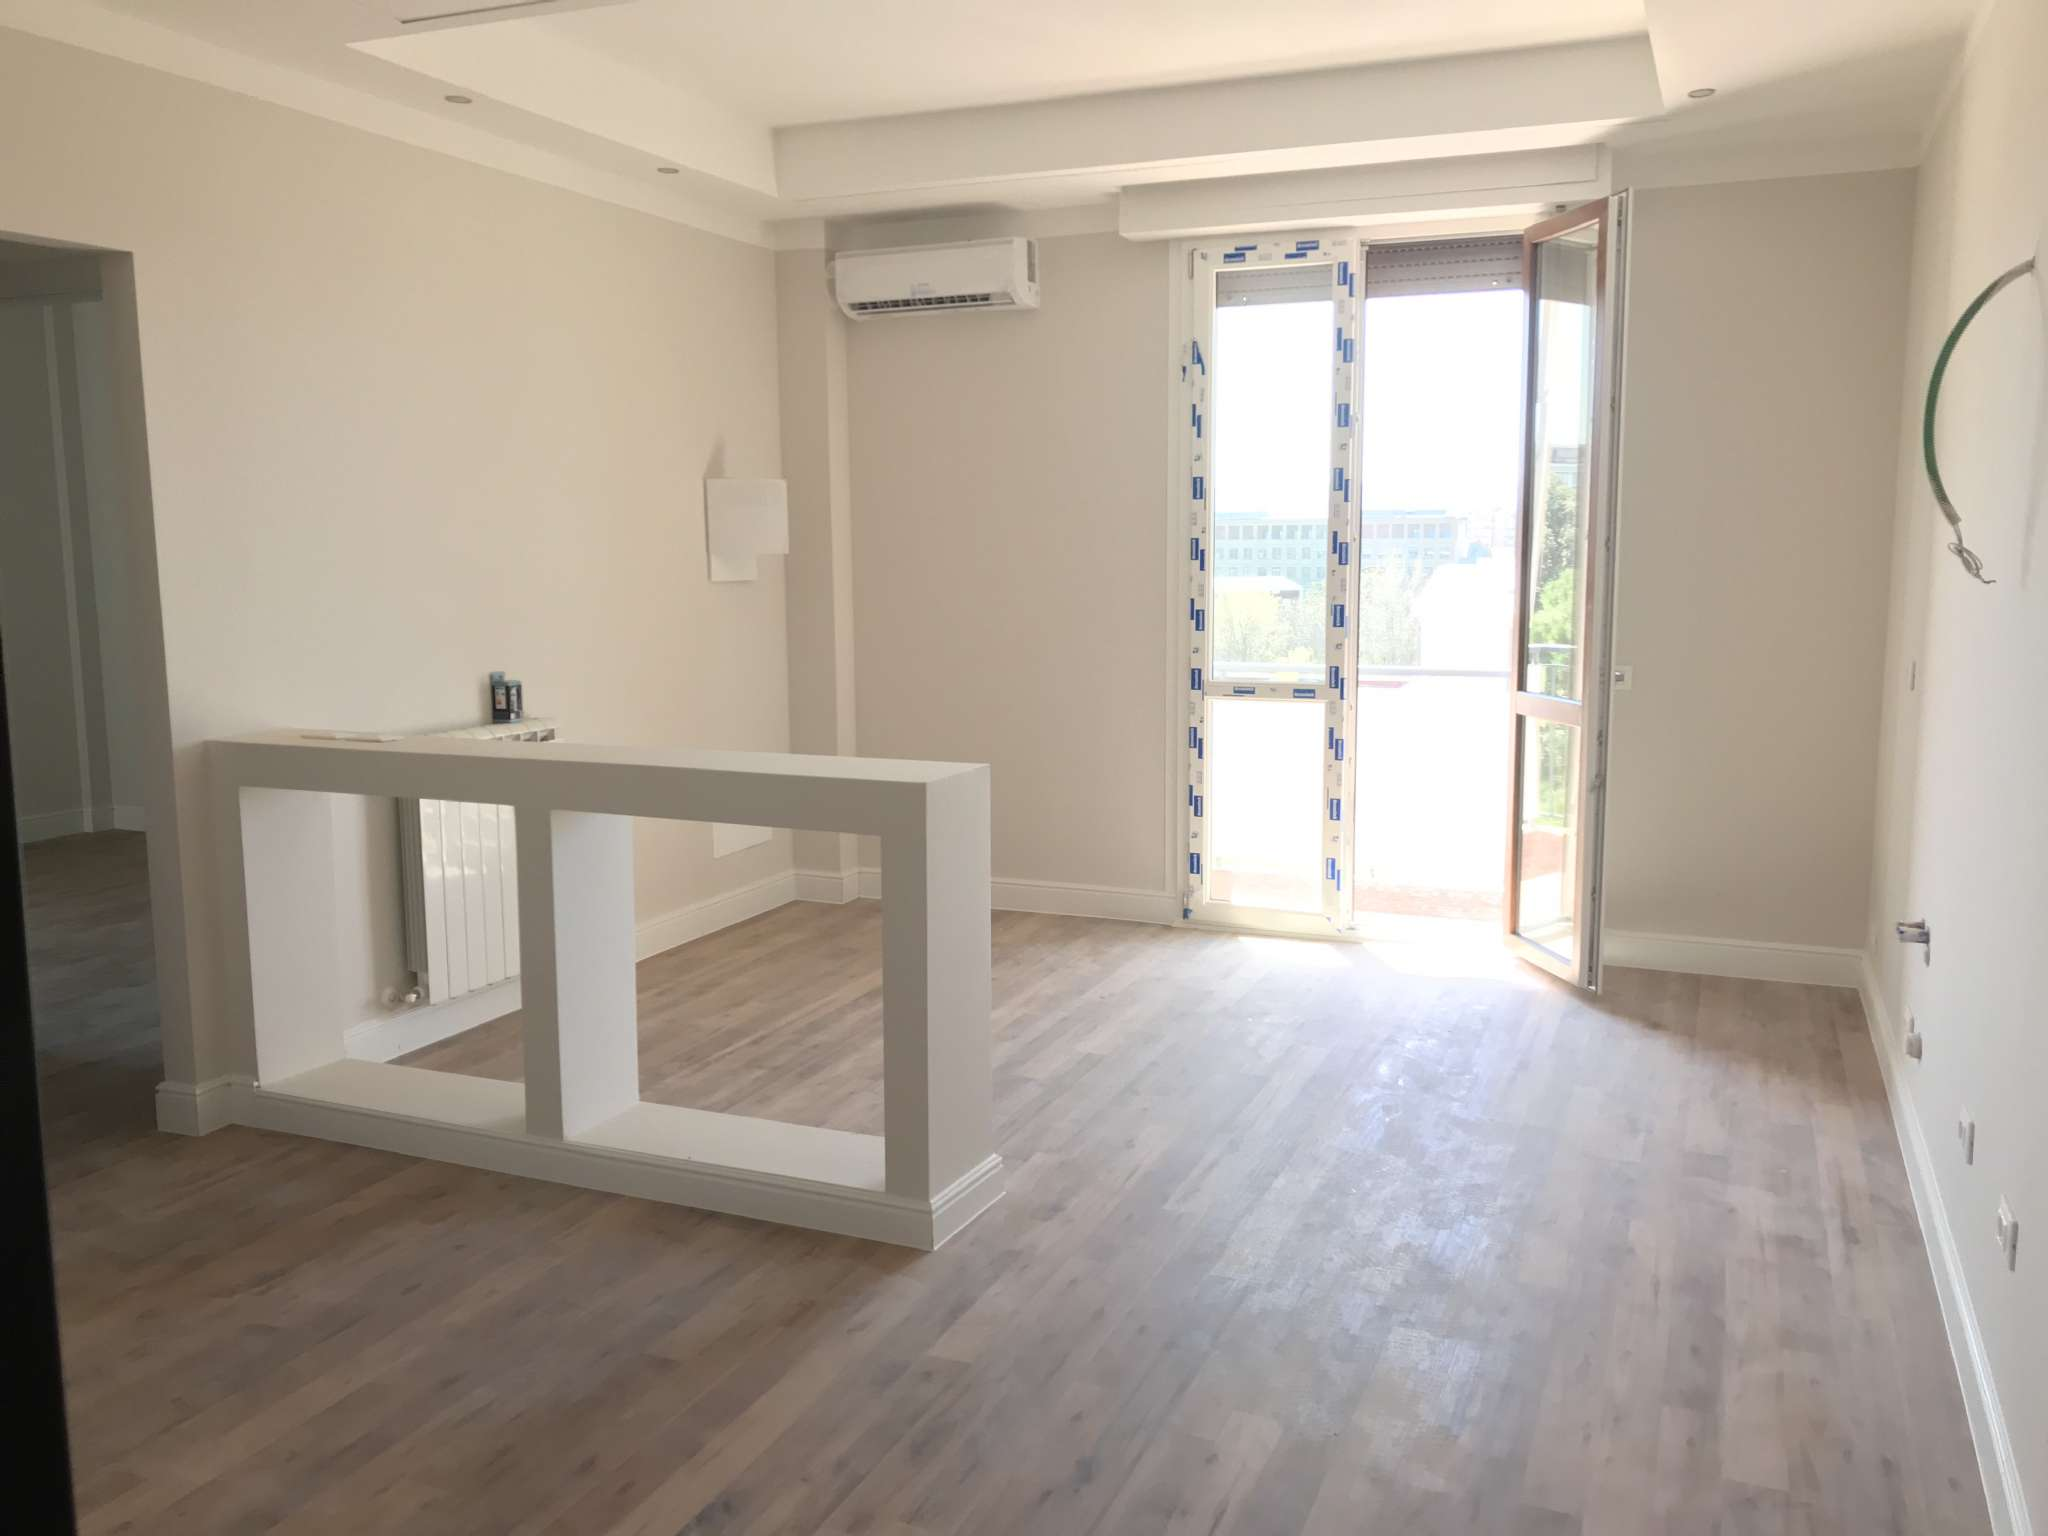 Appartamento in Vendita a Firenze Periferia Nord: 2 locali, 55 mq